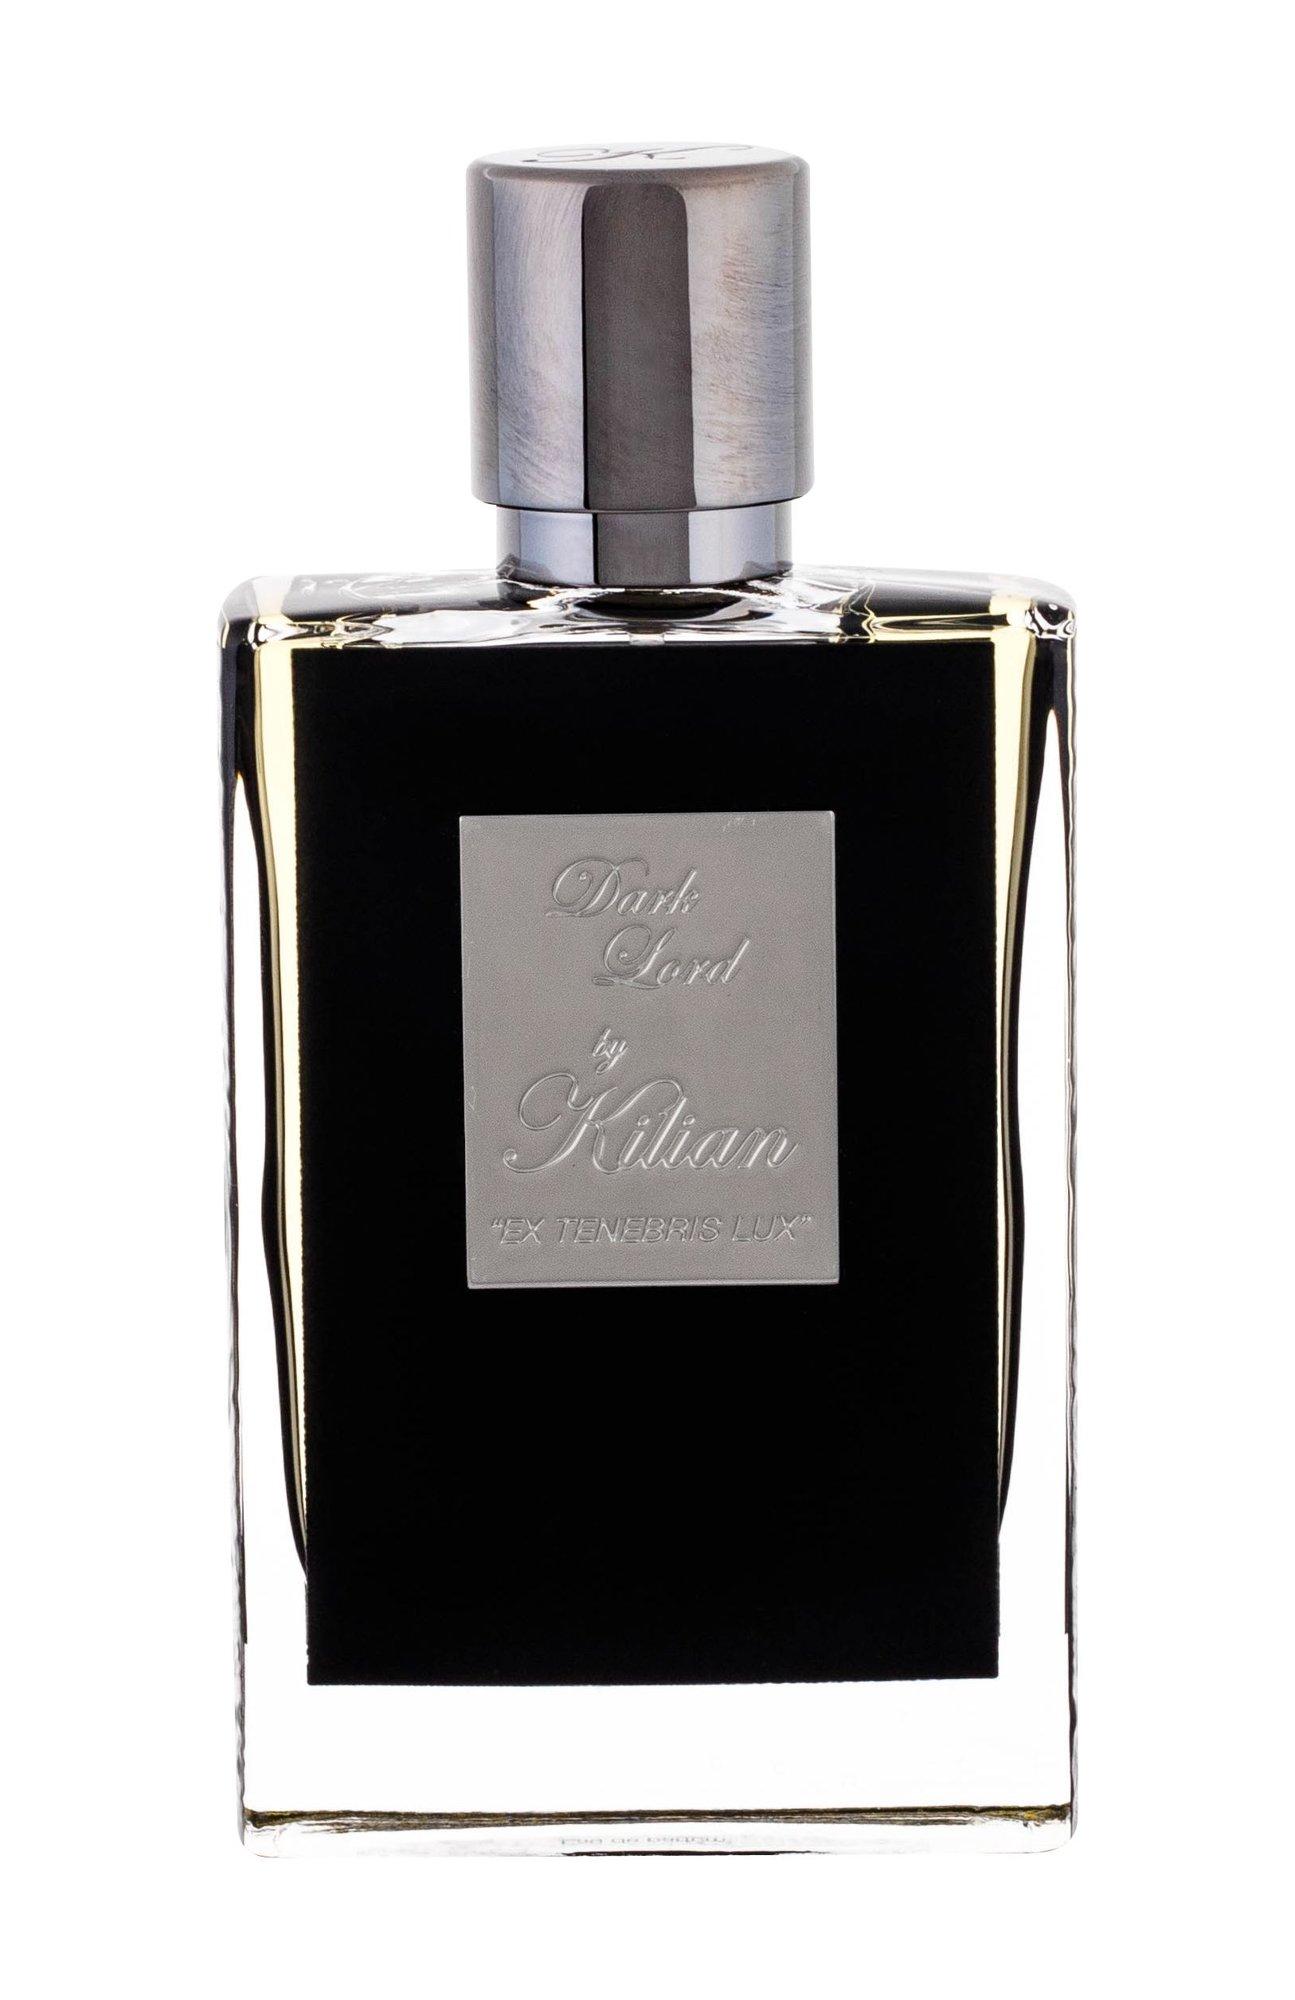 By Kilian The Smokers Eau de Parfum 50ml  Dark Lord